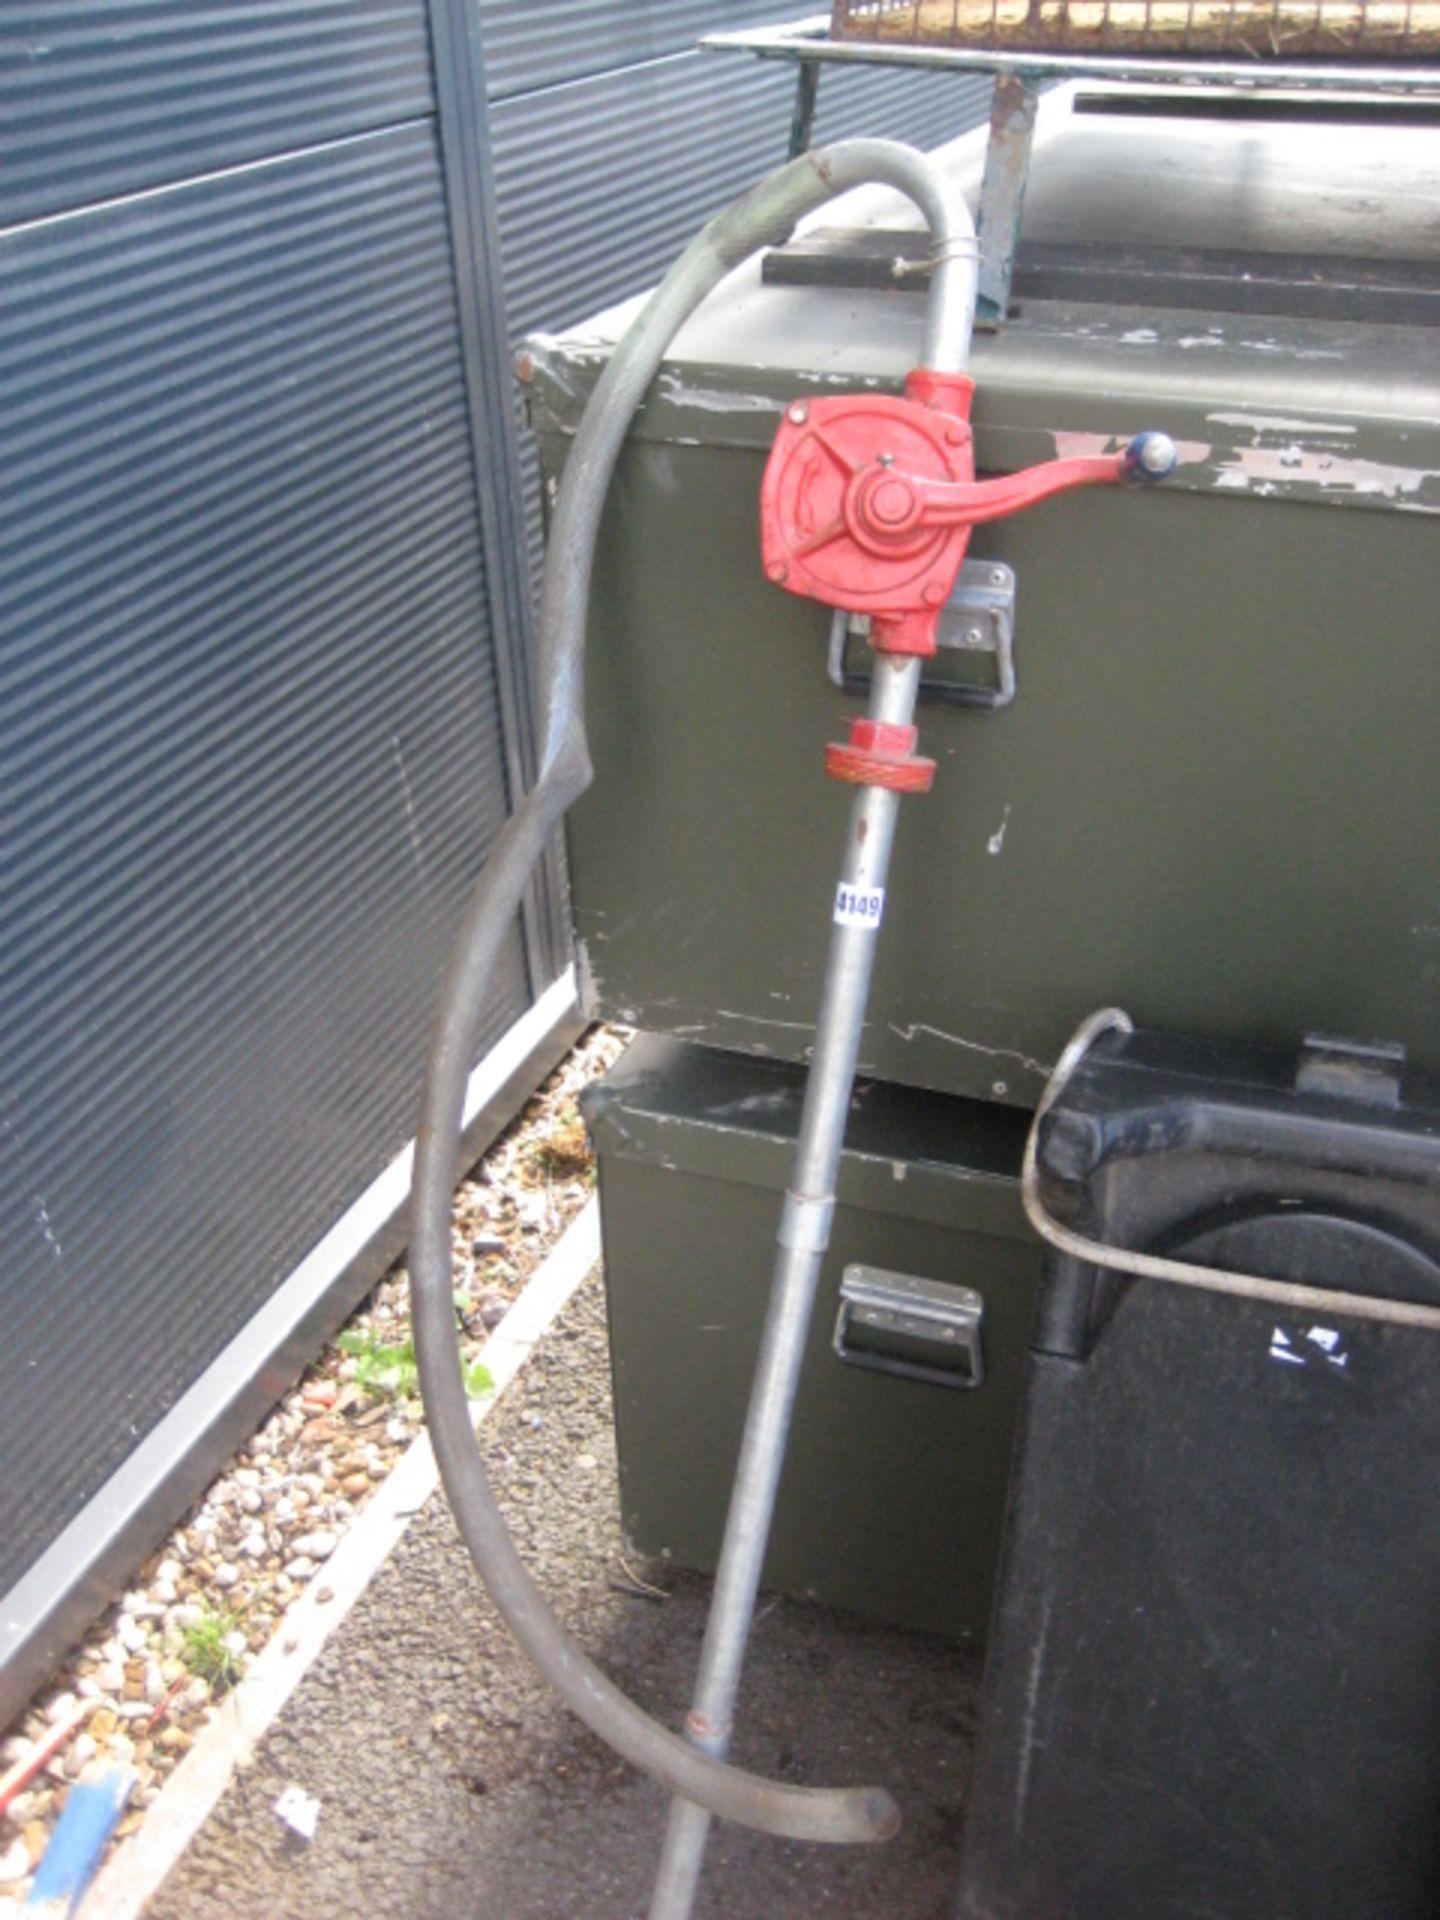 Lot 4149 - Clarke hand fuel pump